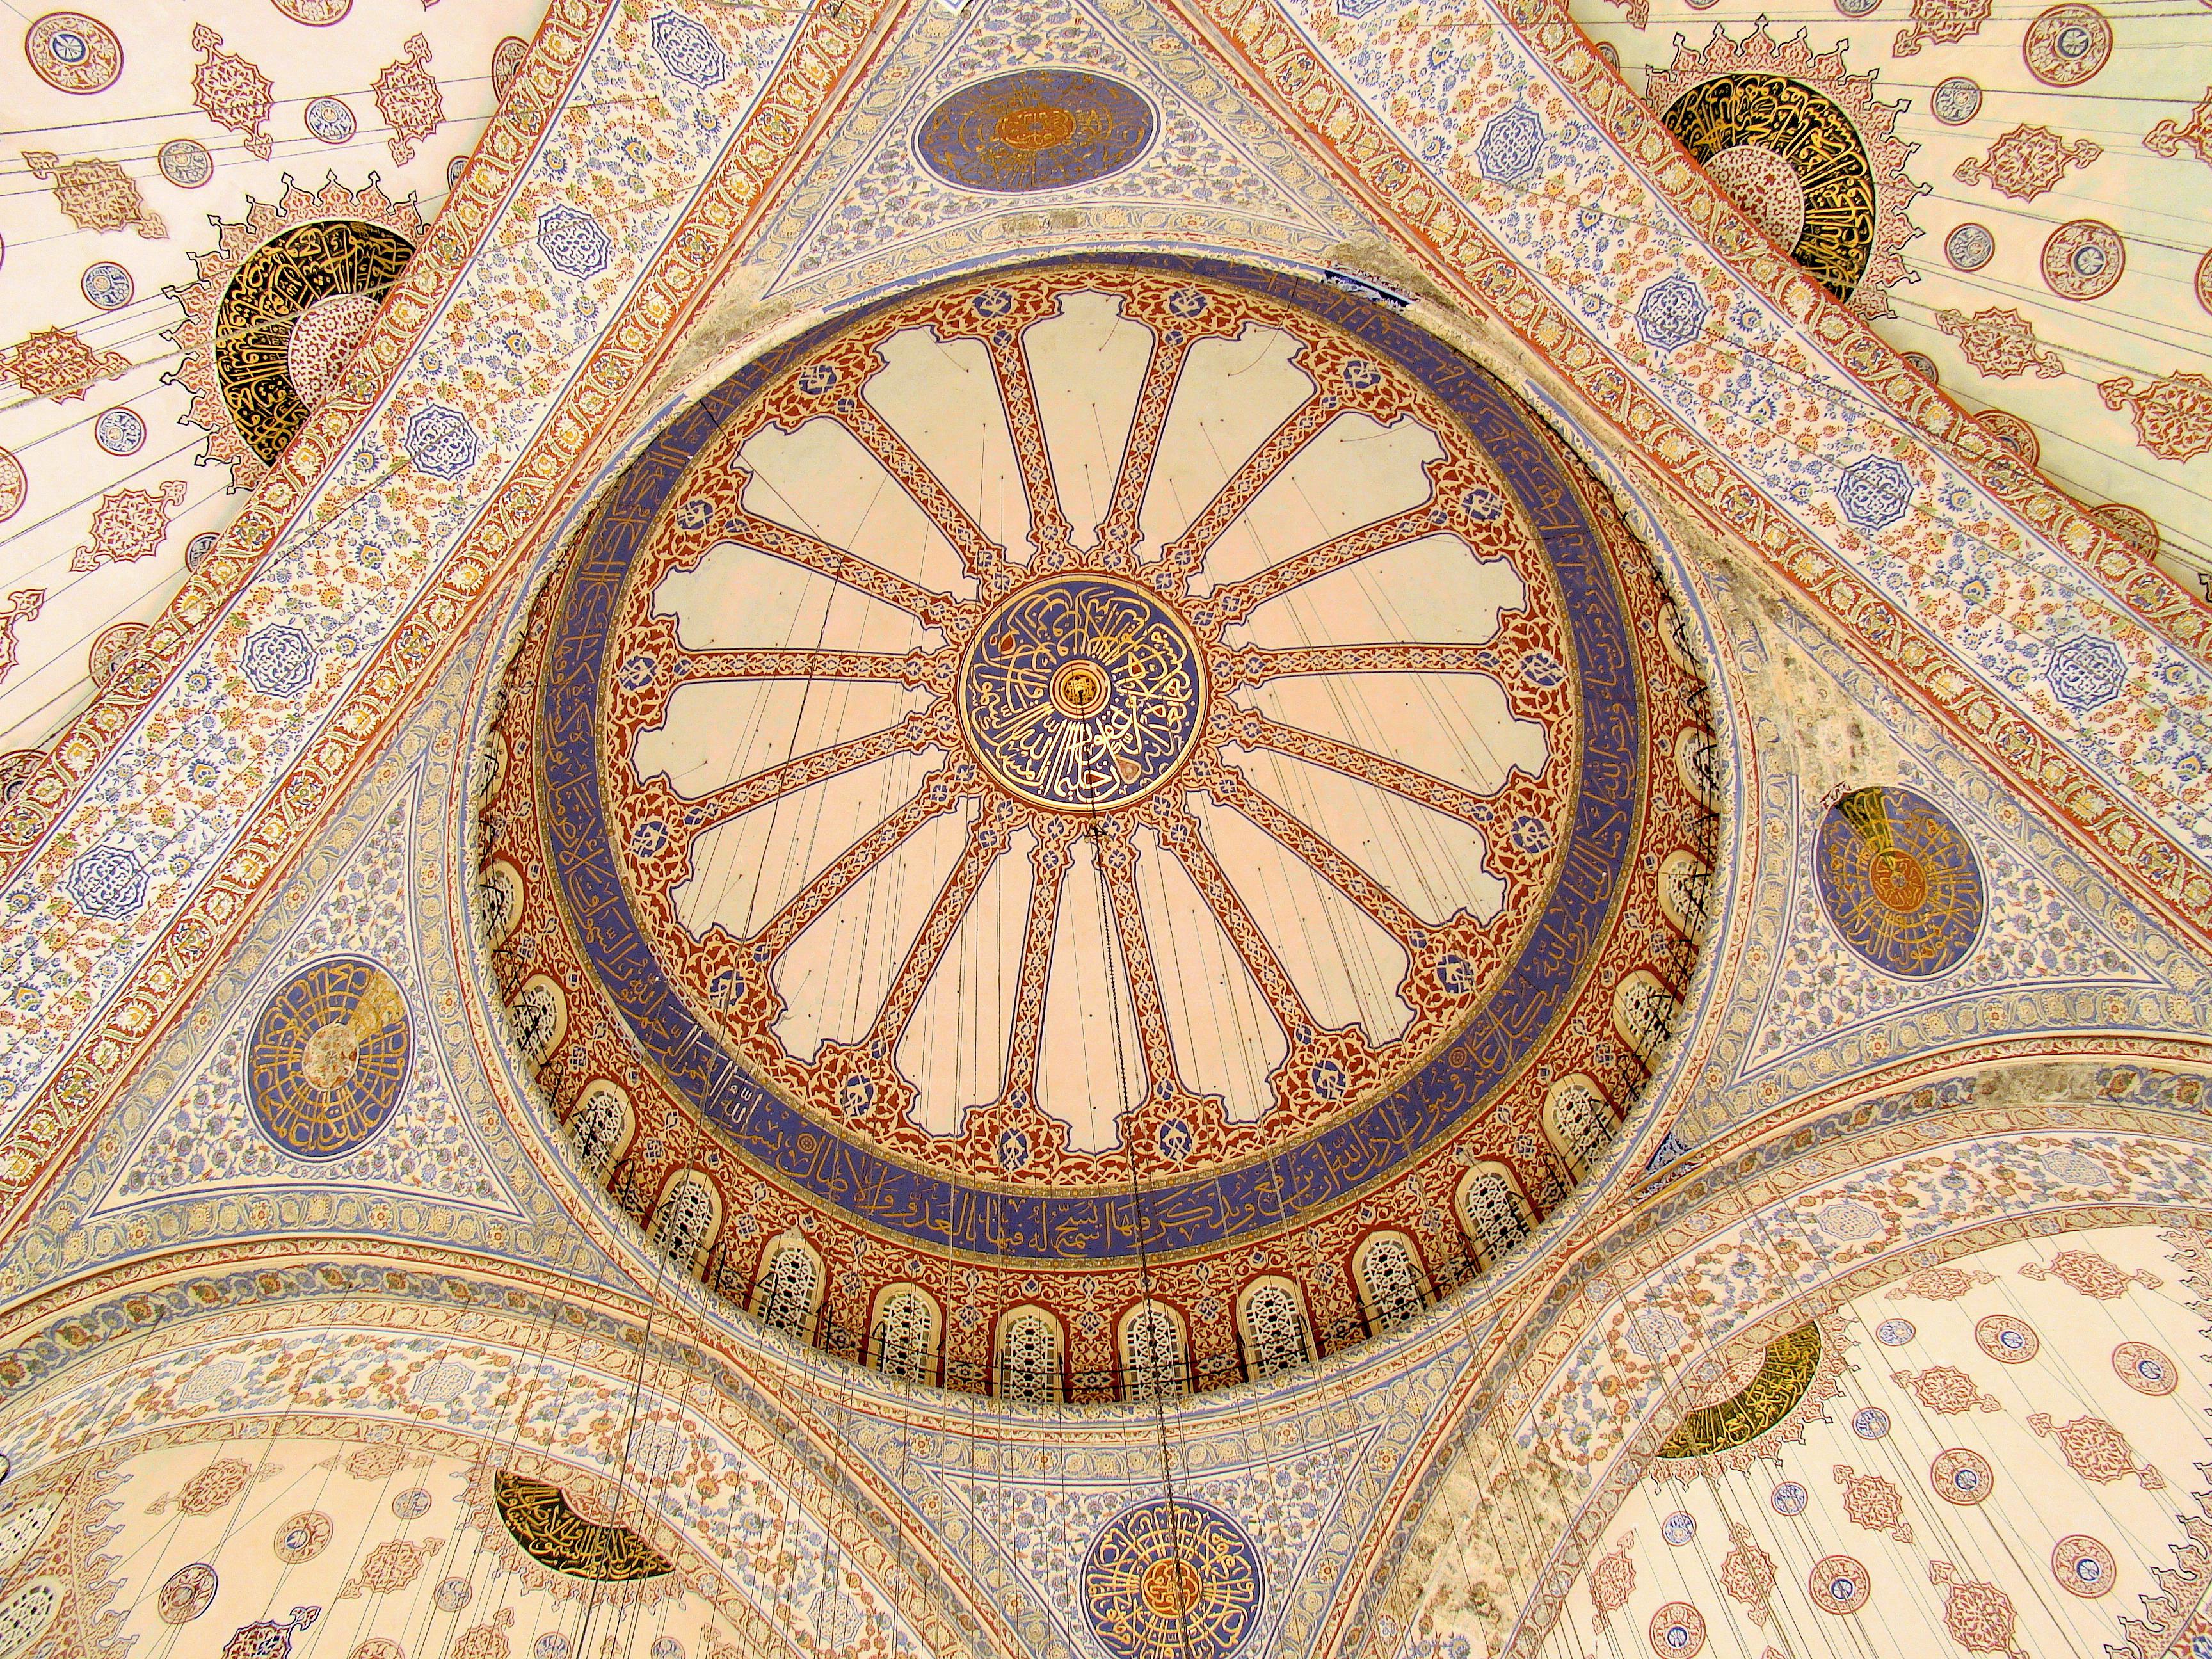 Blue Mosque Ceiling Blue Tiles.JPG